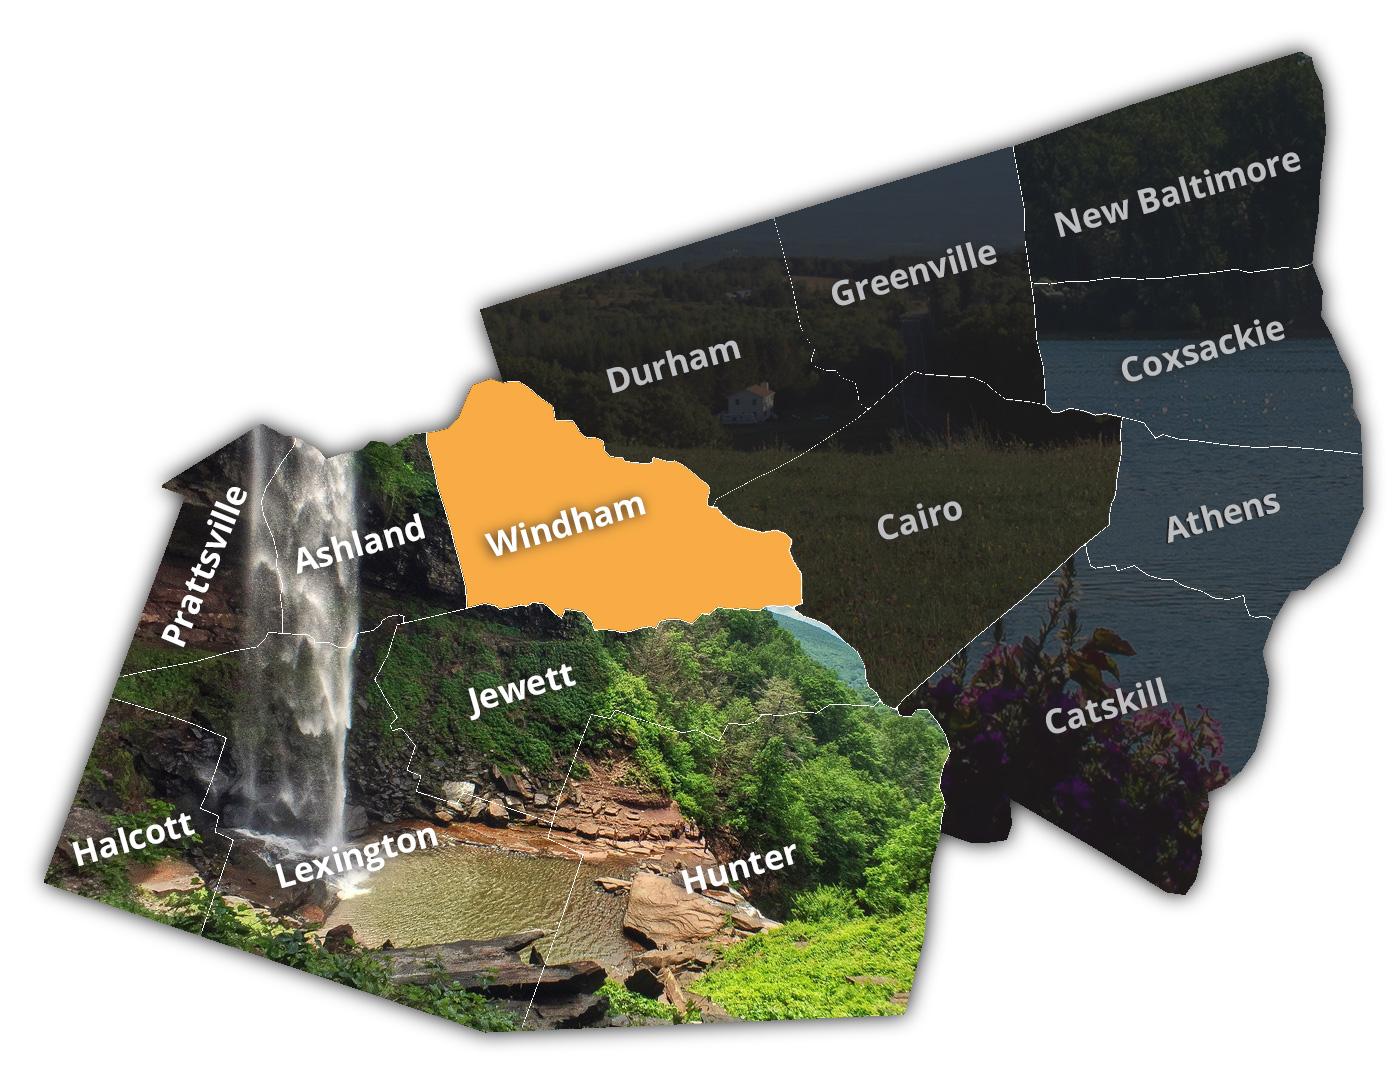 Windham in Greene County